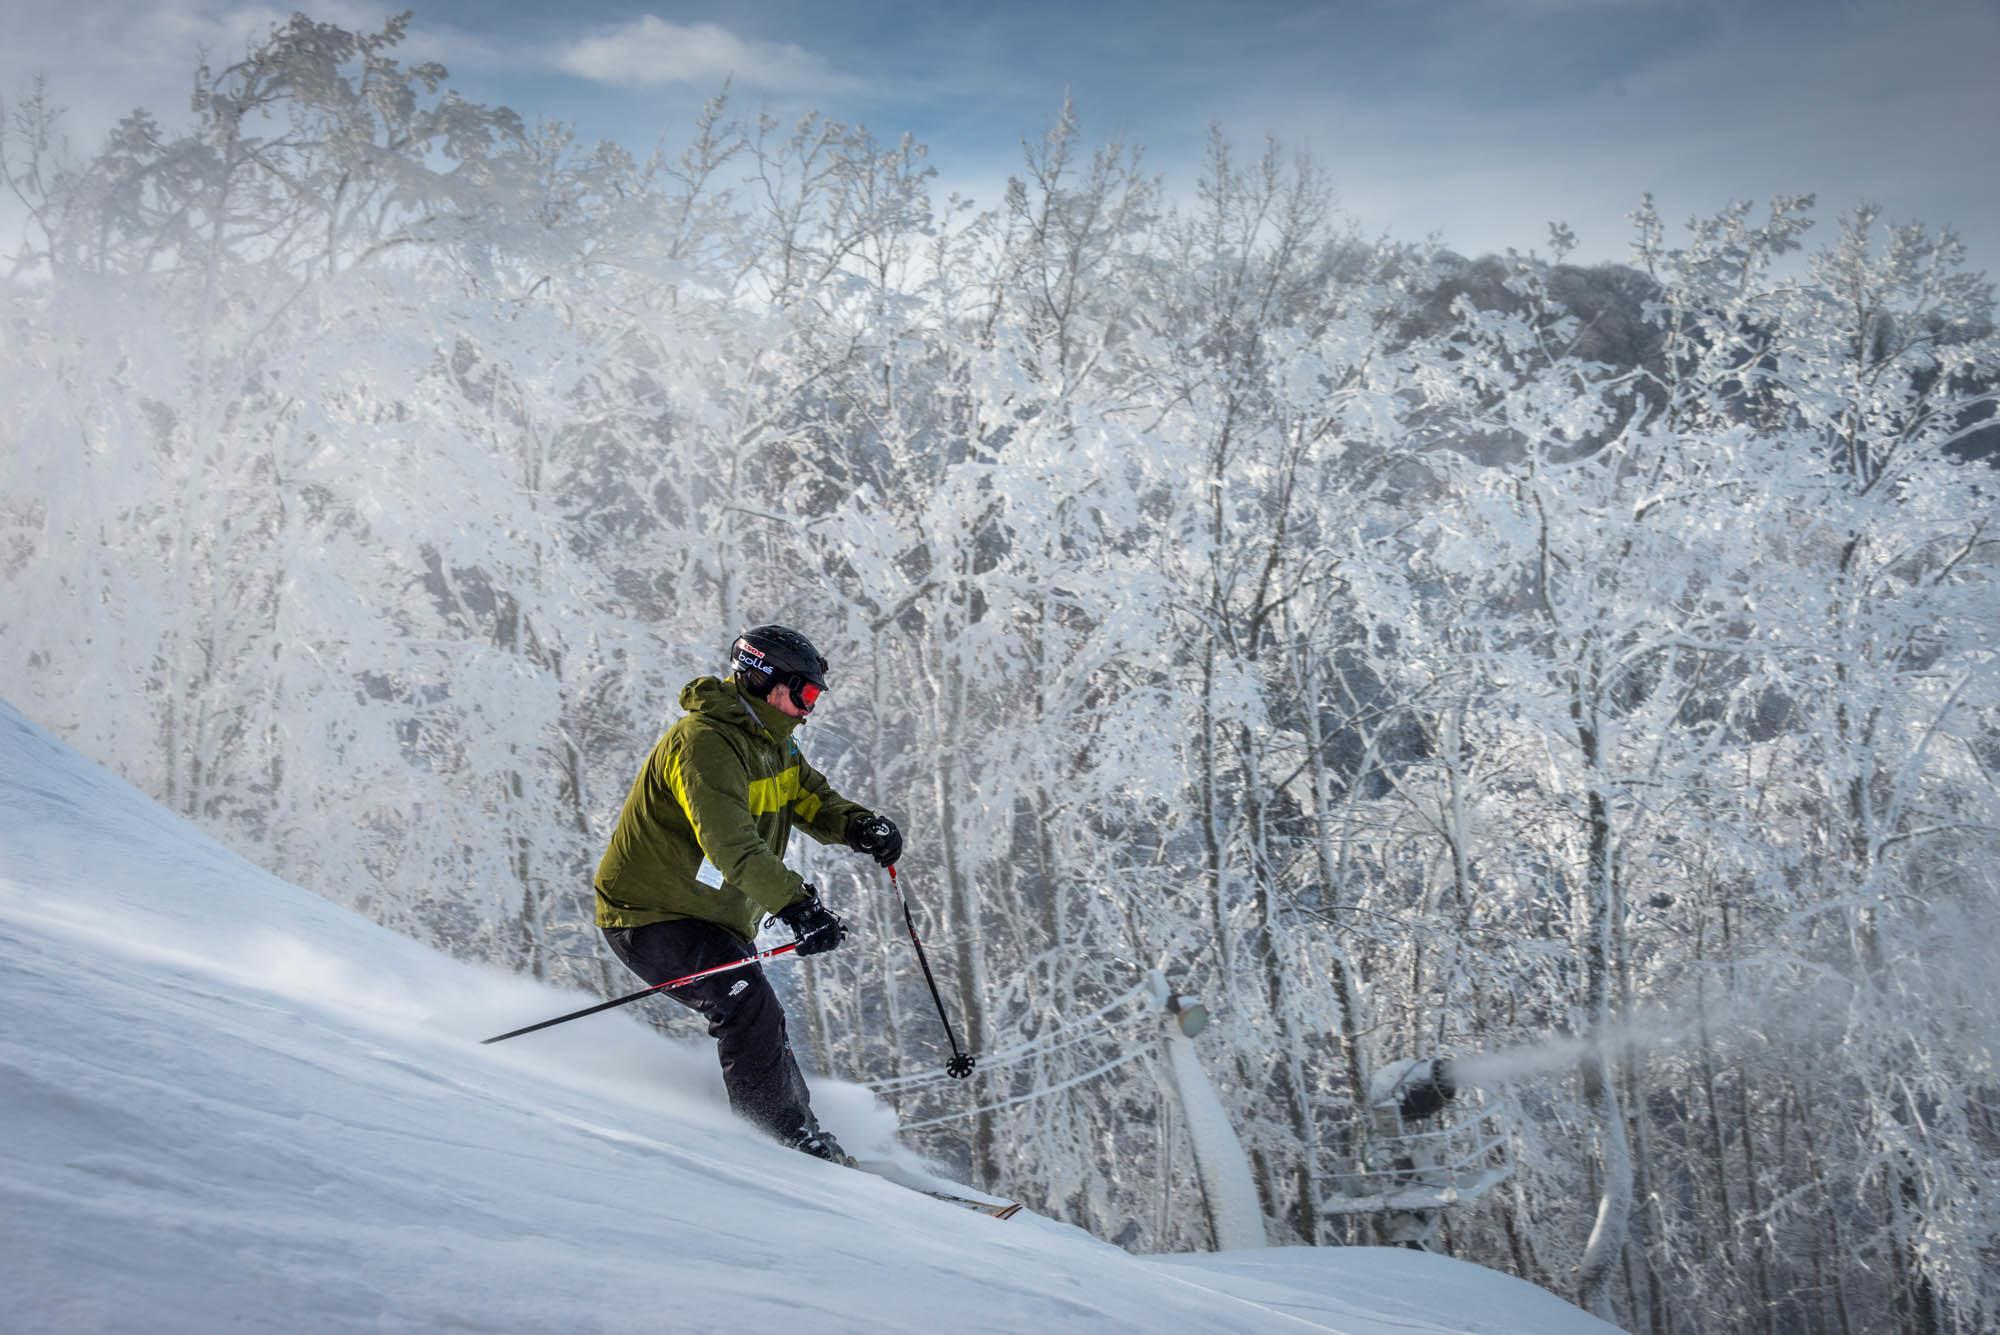 Snow skiing near memphis tn